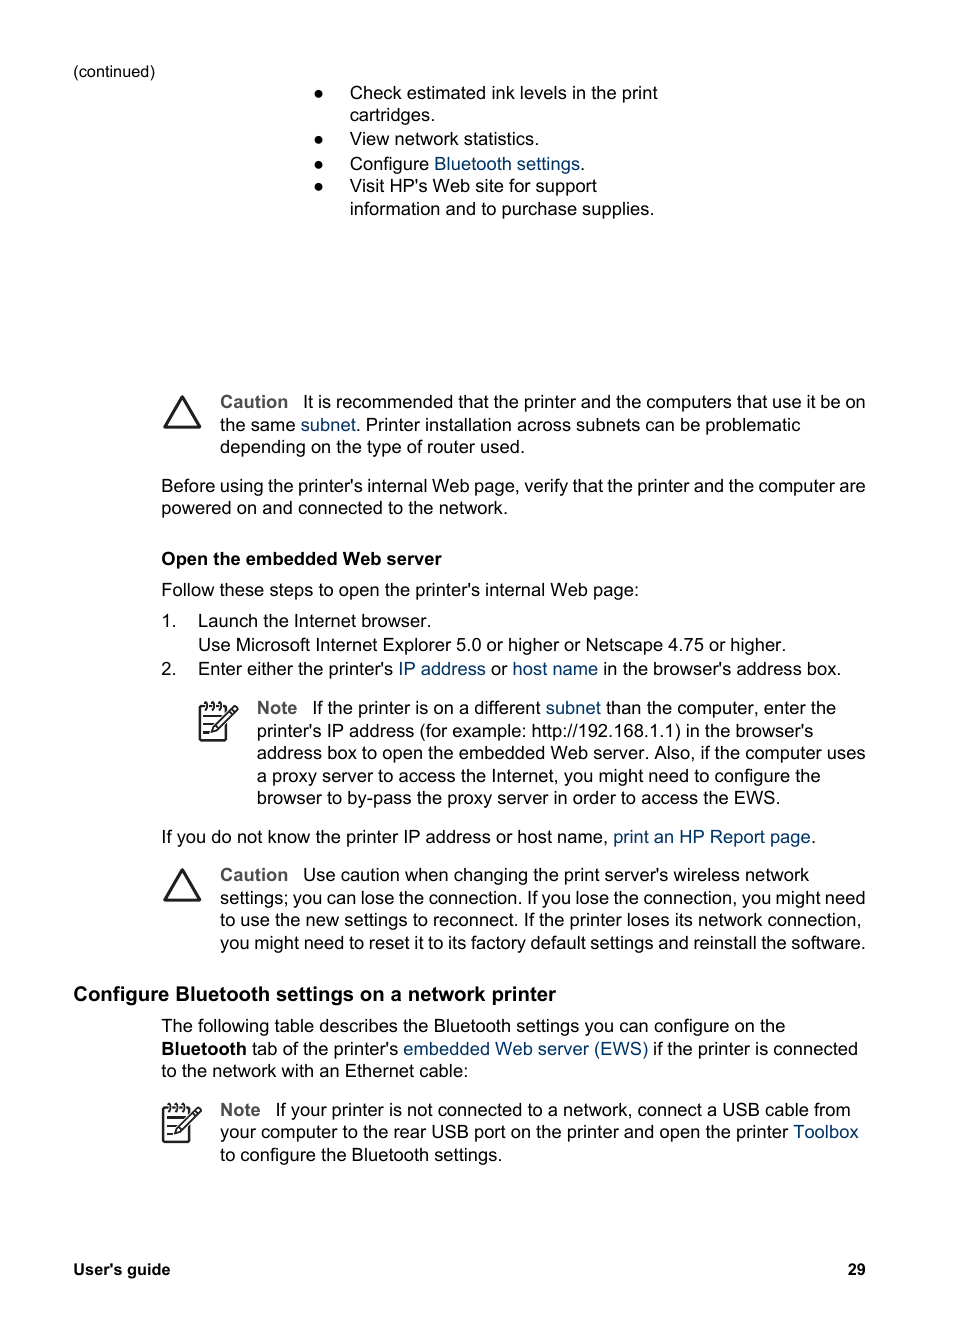 Configure bluetooth settings on a network printer | HP